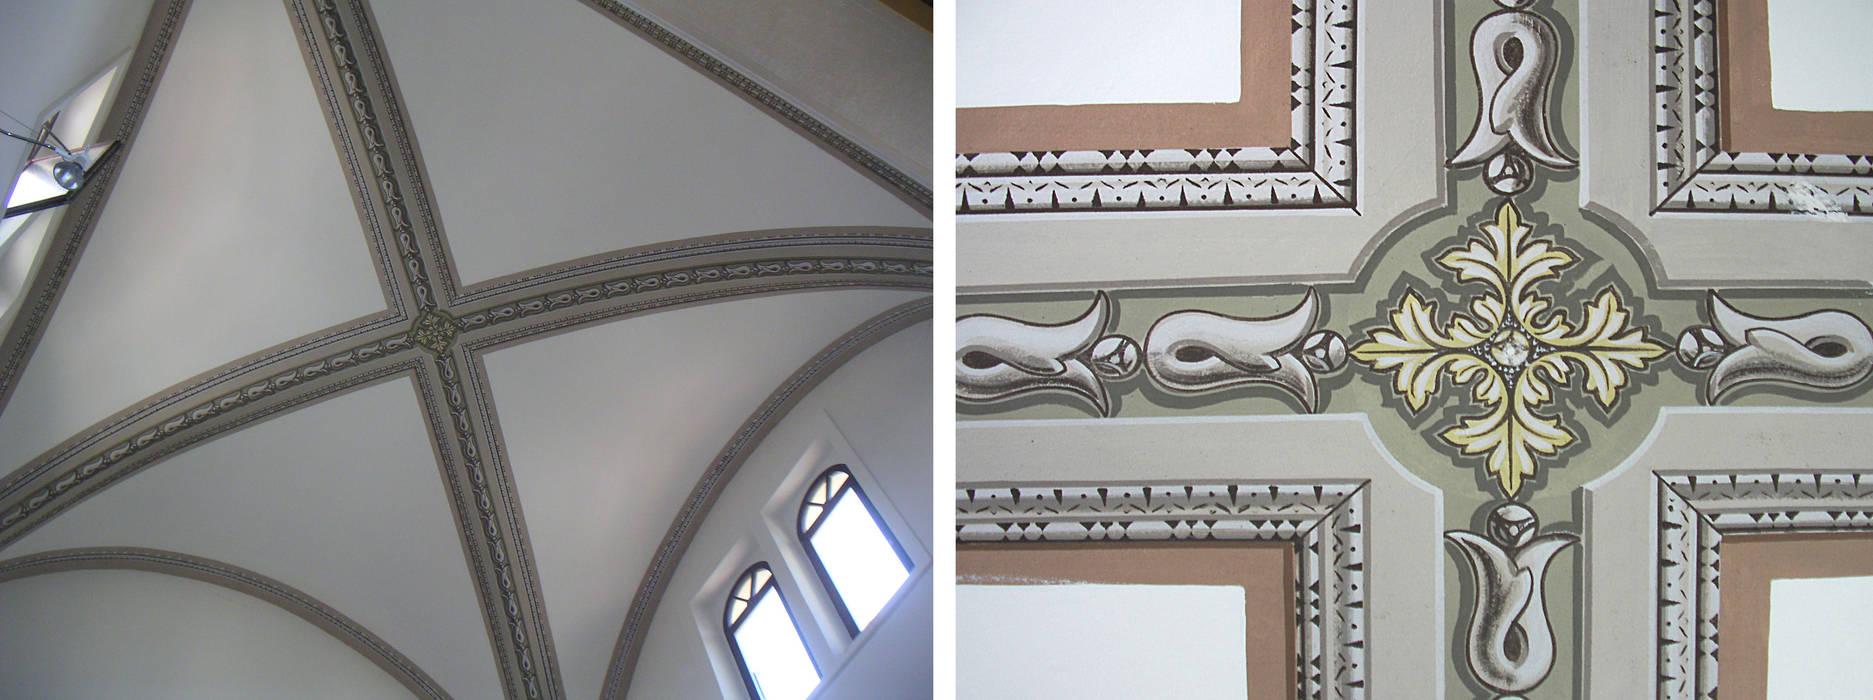 Decorazione dell'abside di una chiesa. Tempera.: Pareti in stile  di erica de rosa, dipinti, affreschi, trompe l'oeil,  decorazioni - Venezia